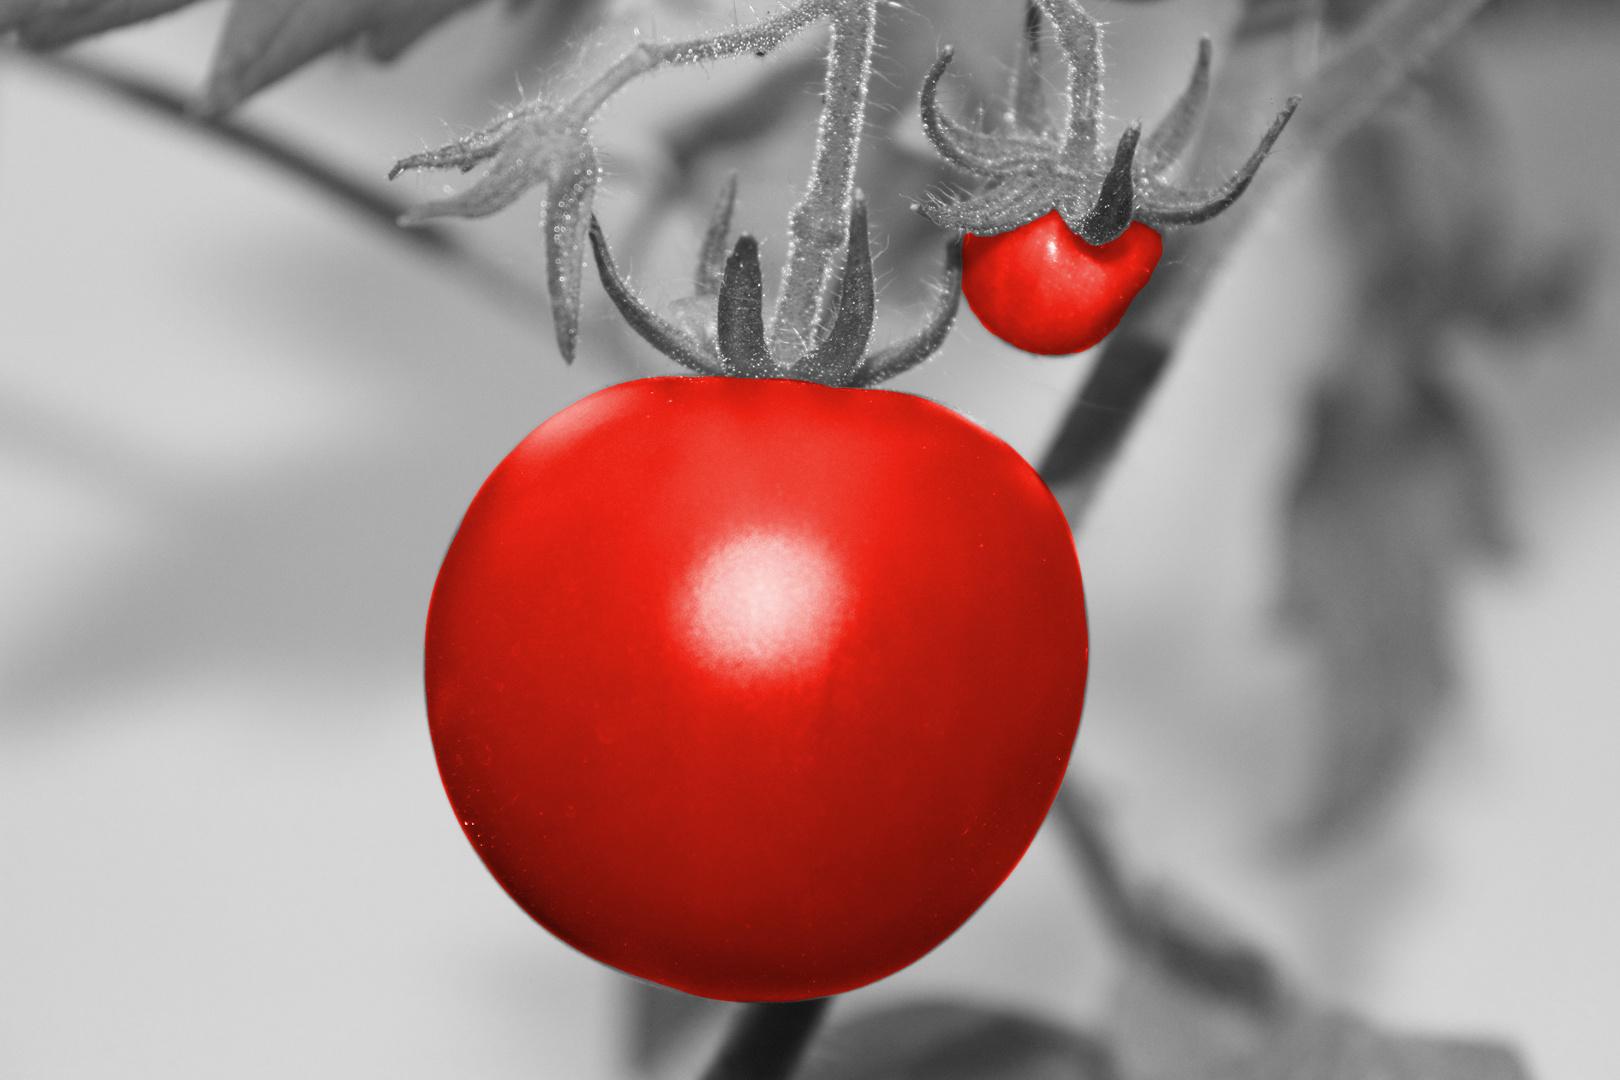 Tomatenretusche